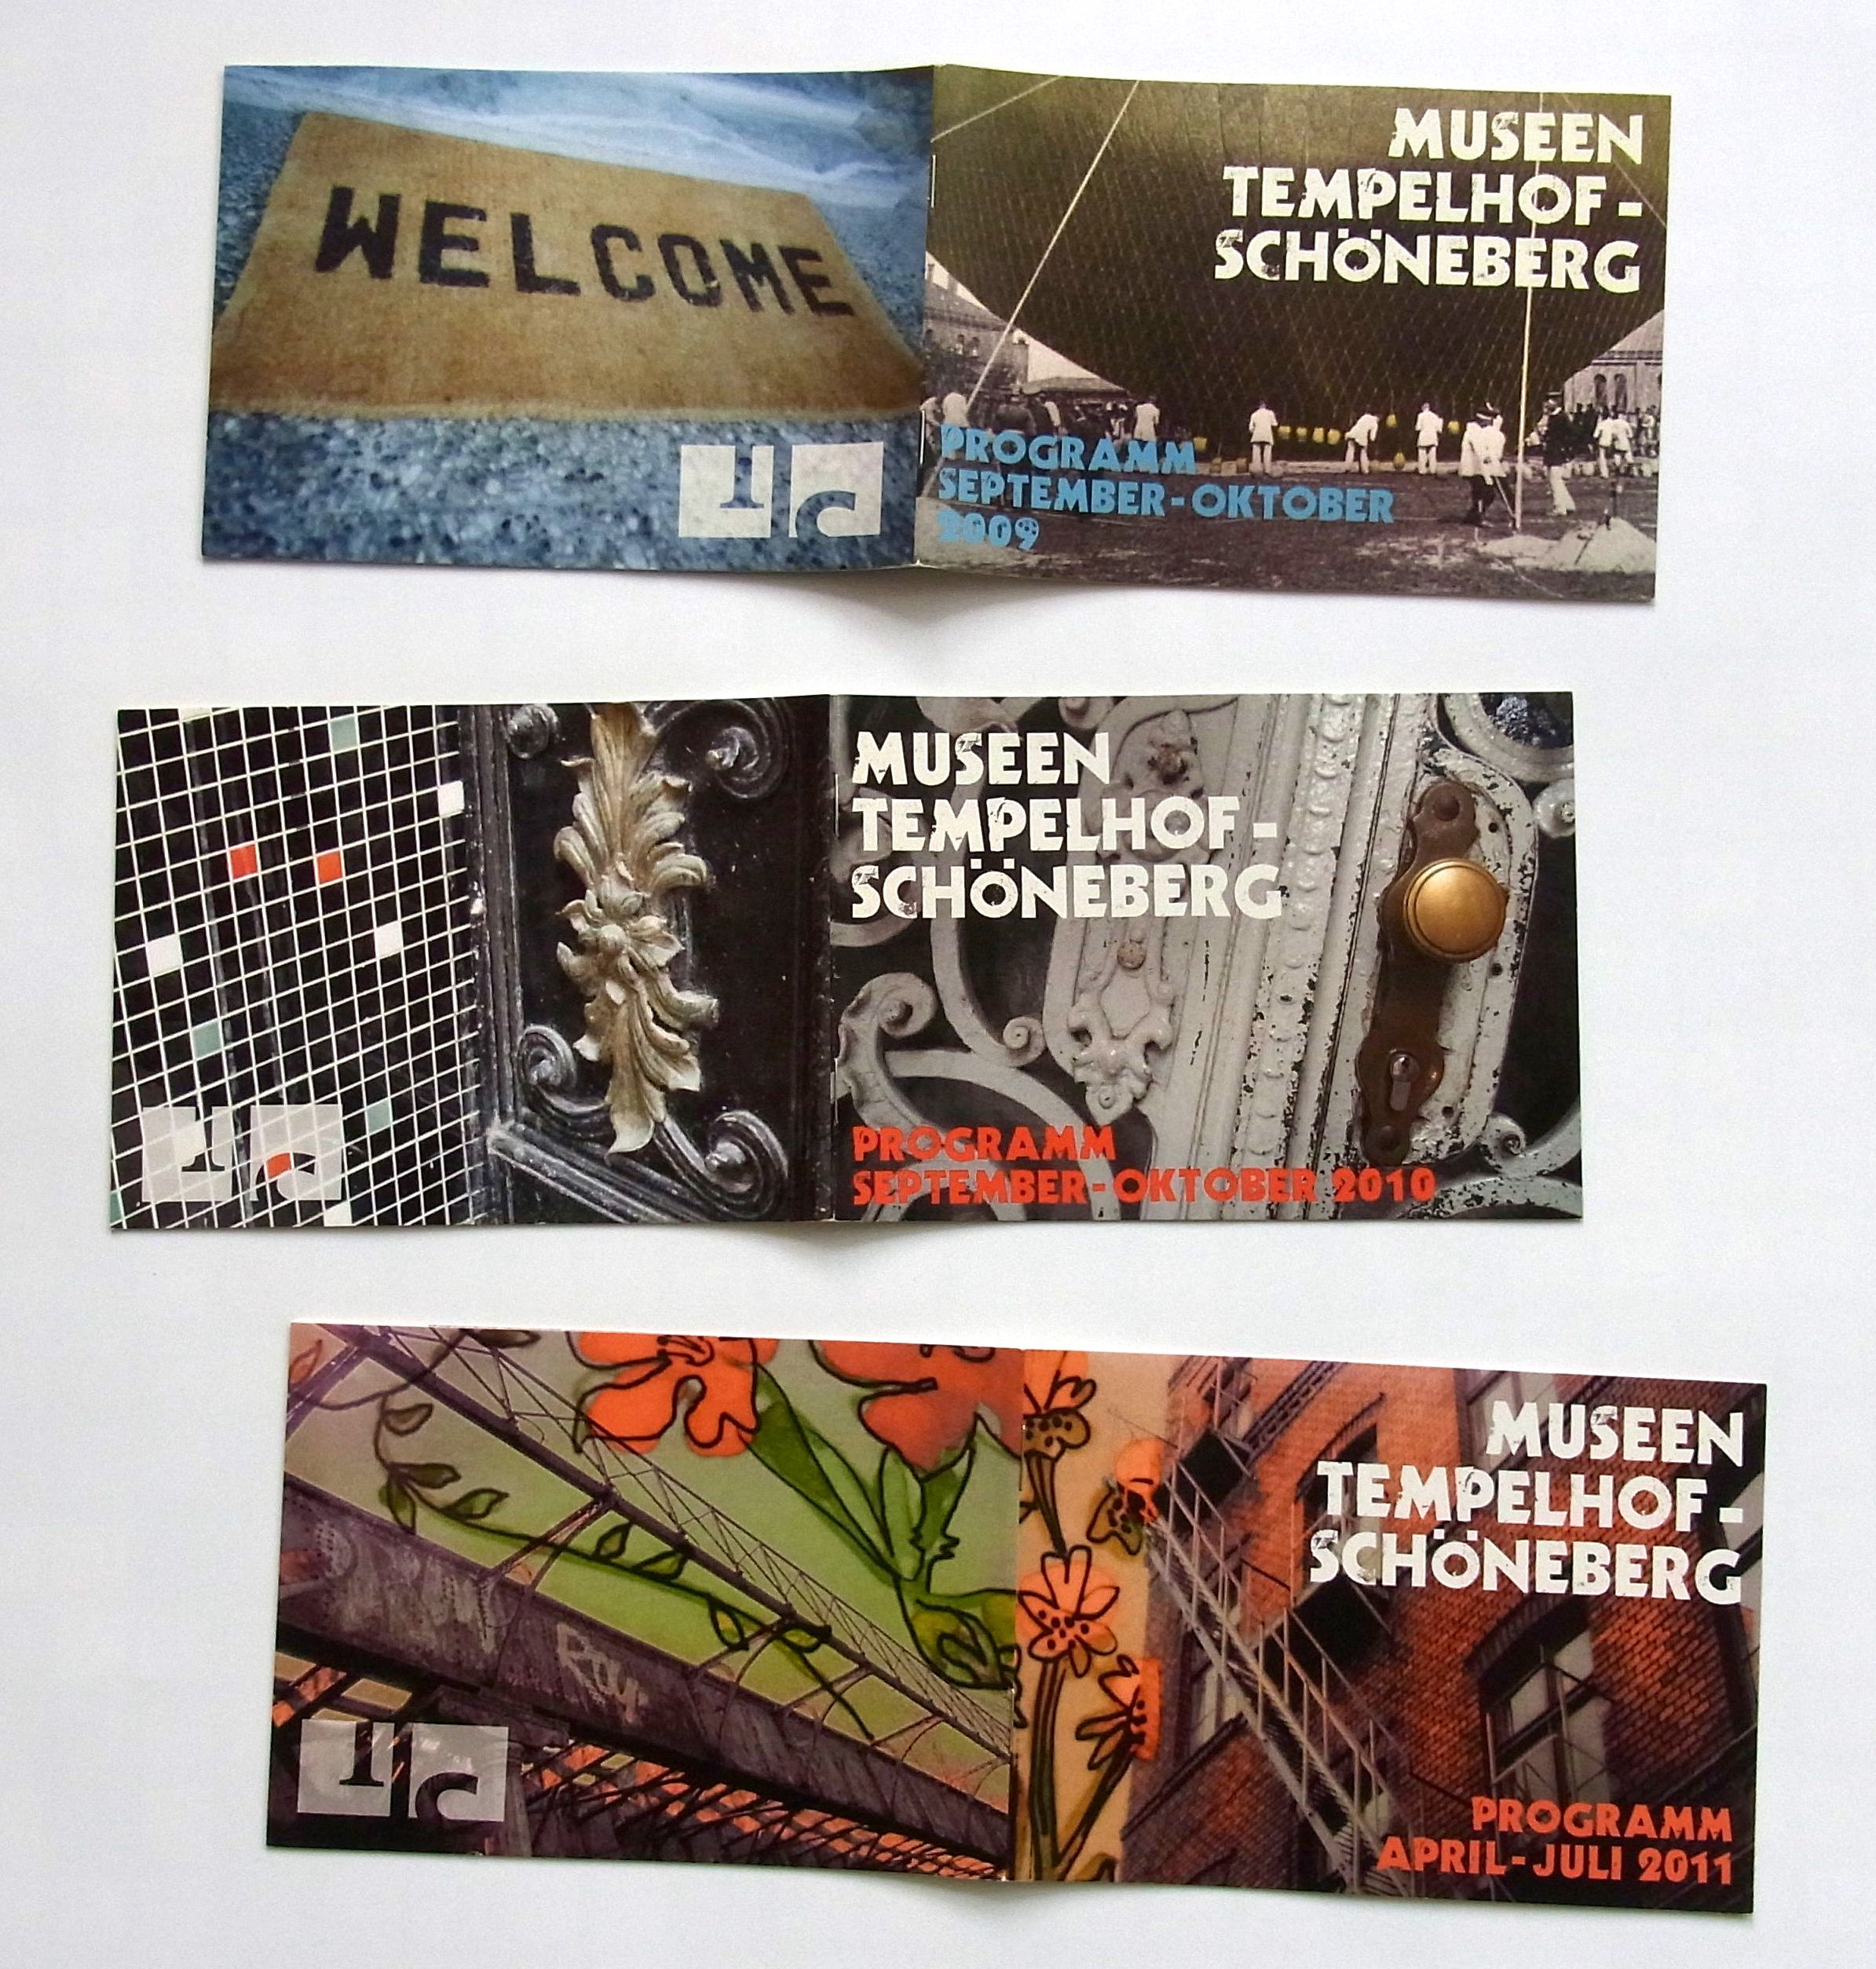 Programme Museen Tempelhof-Schöneberg